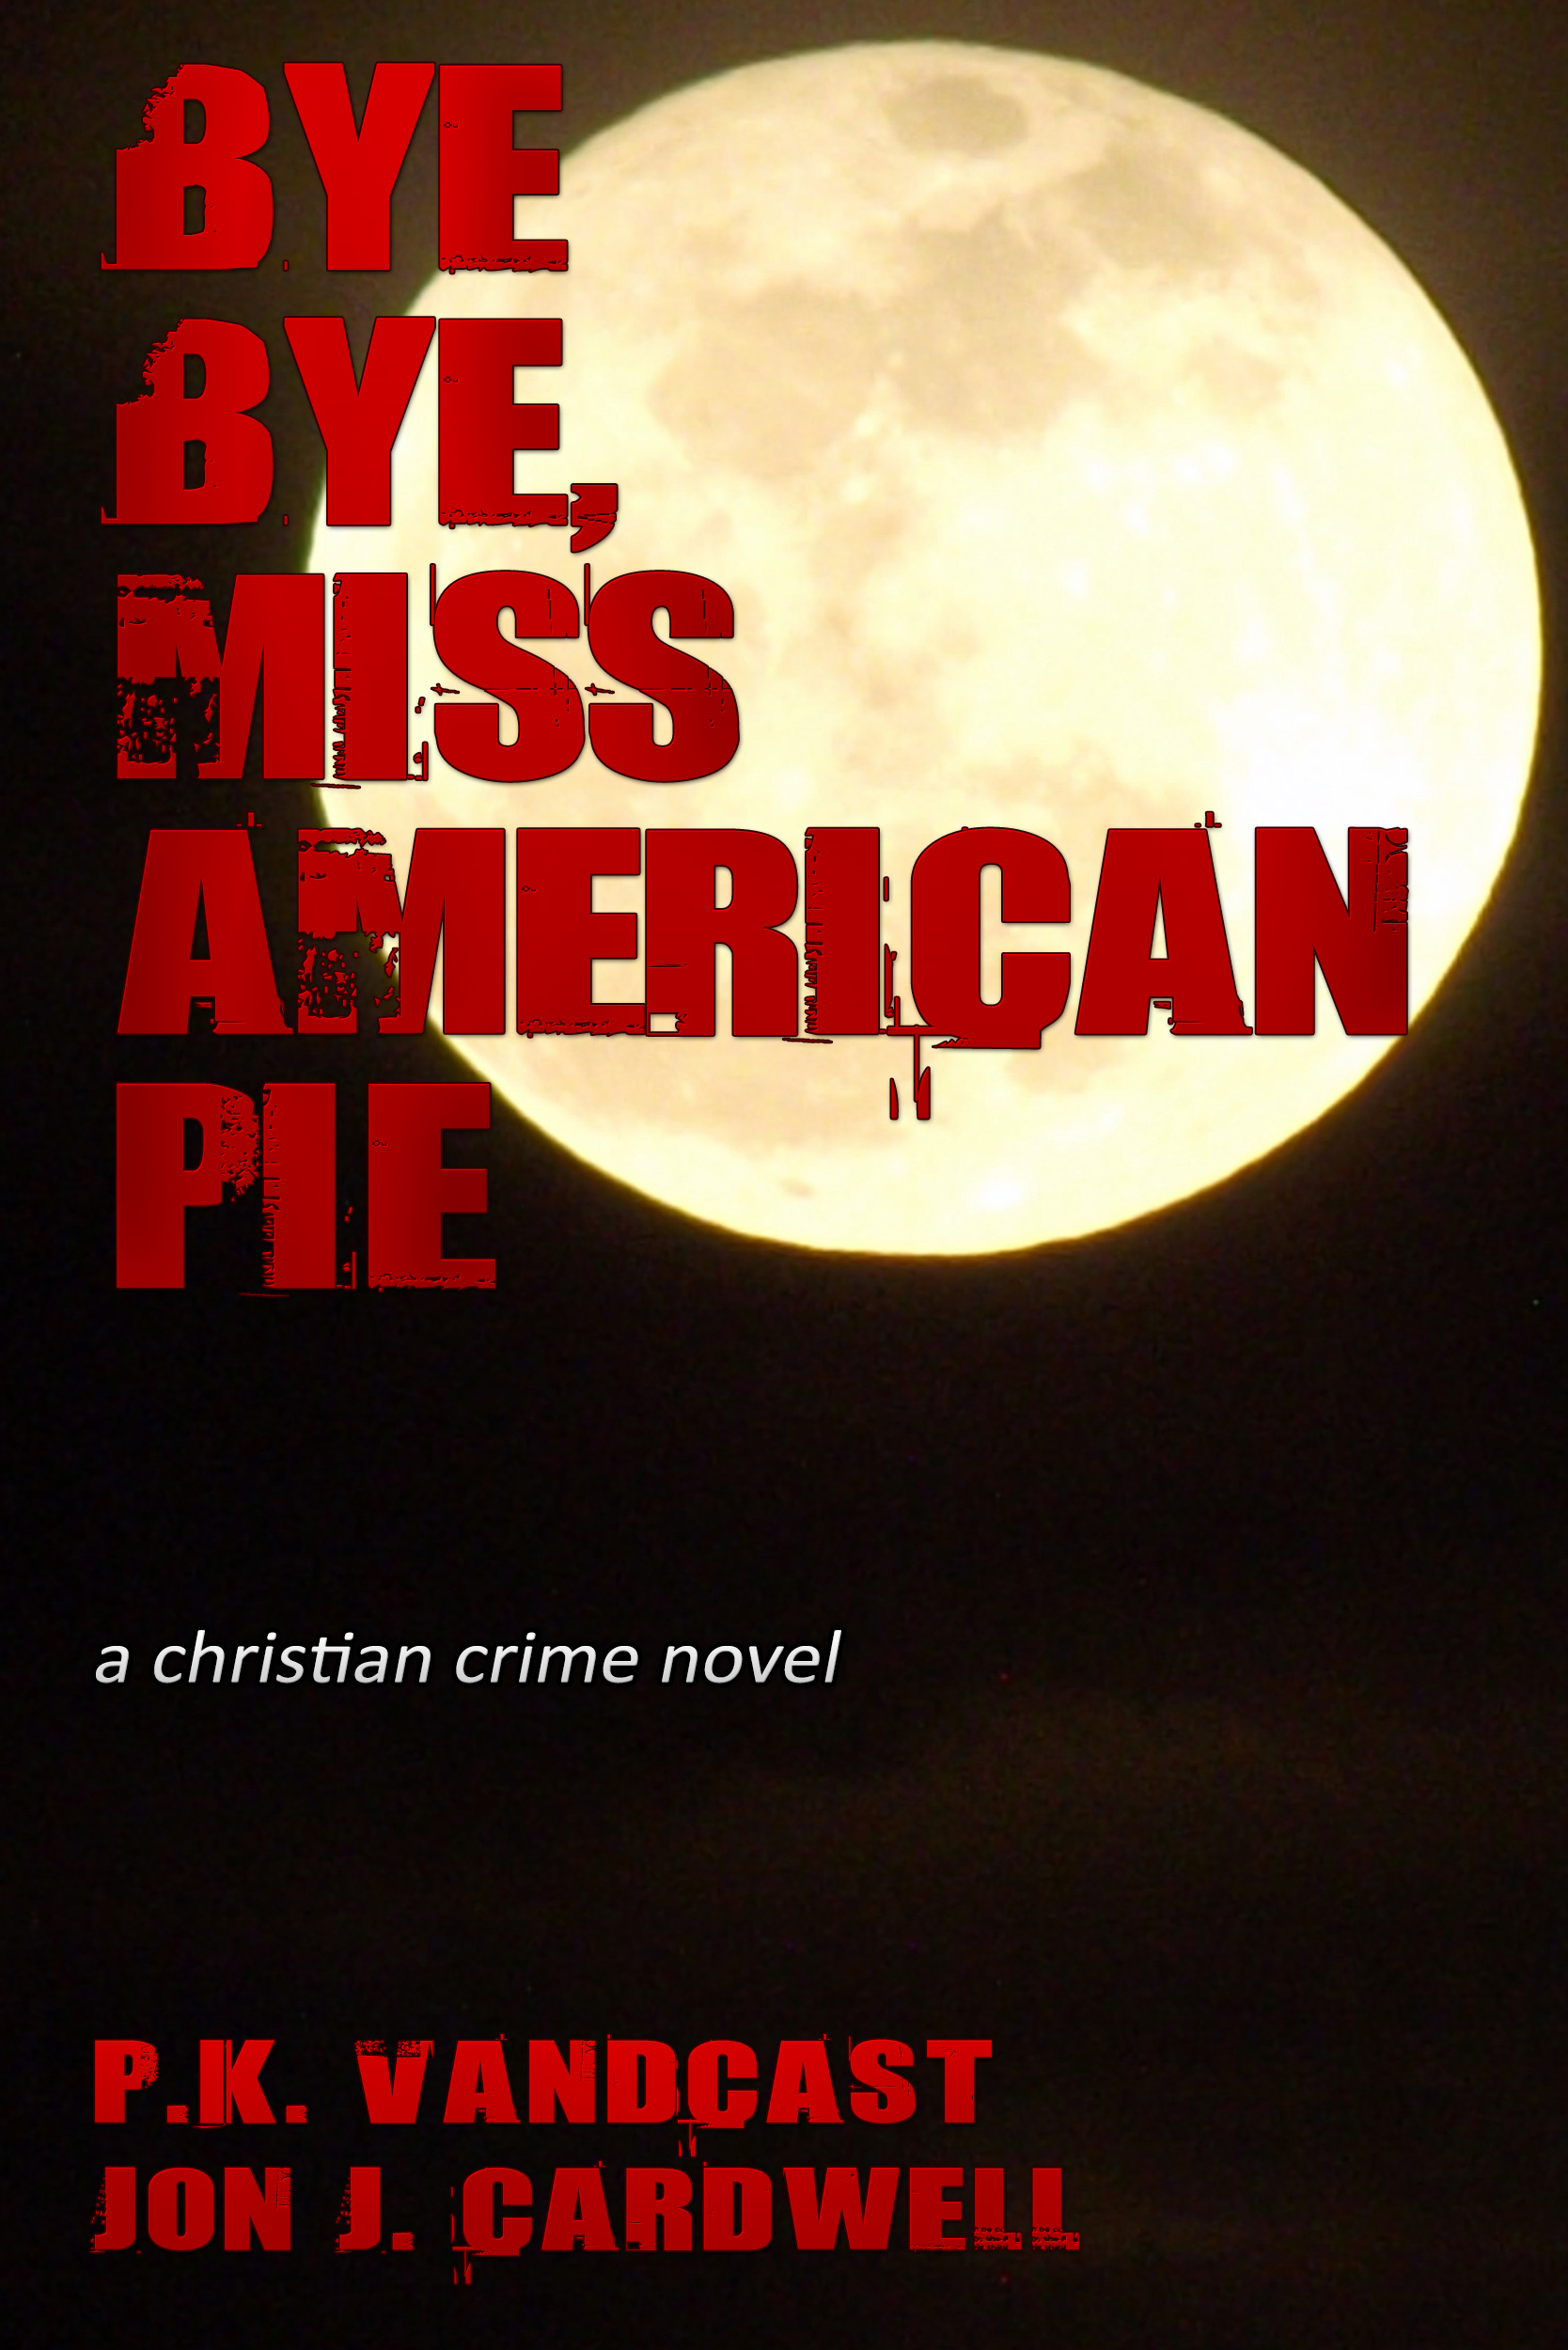 Bye Bye, Miss American Pie: A Christian Crime Novel P K Vandcast